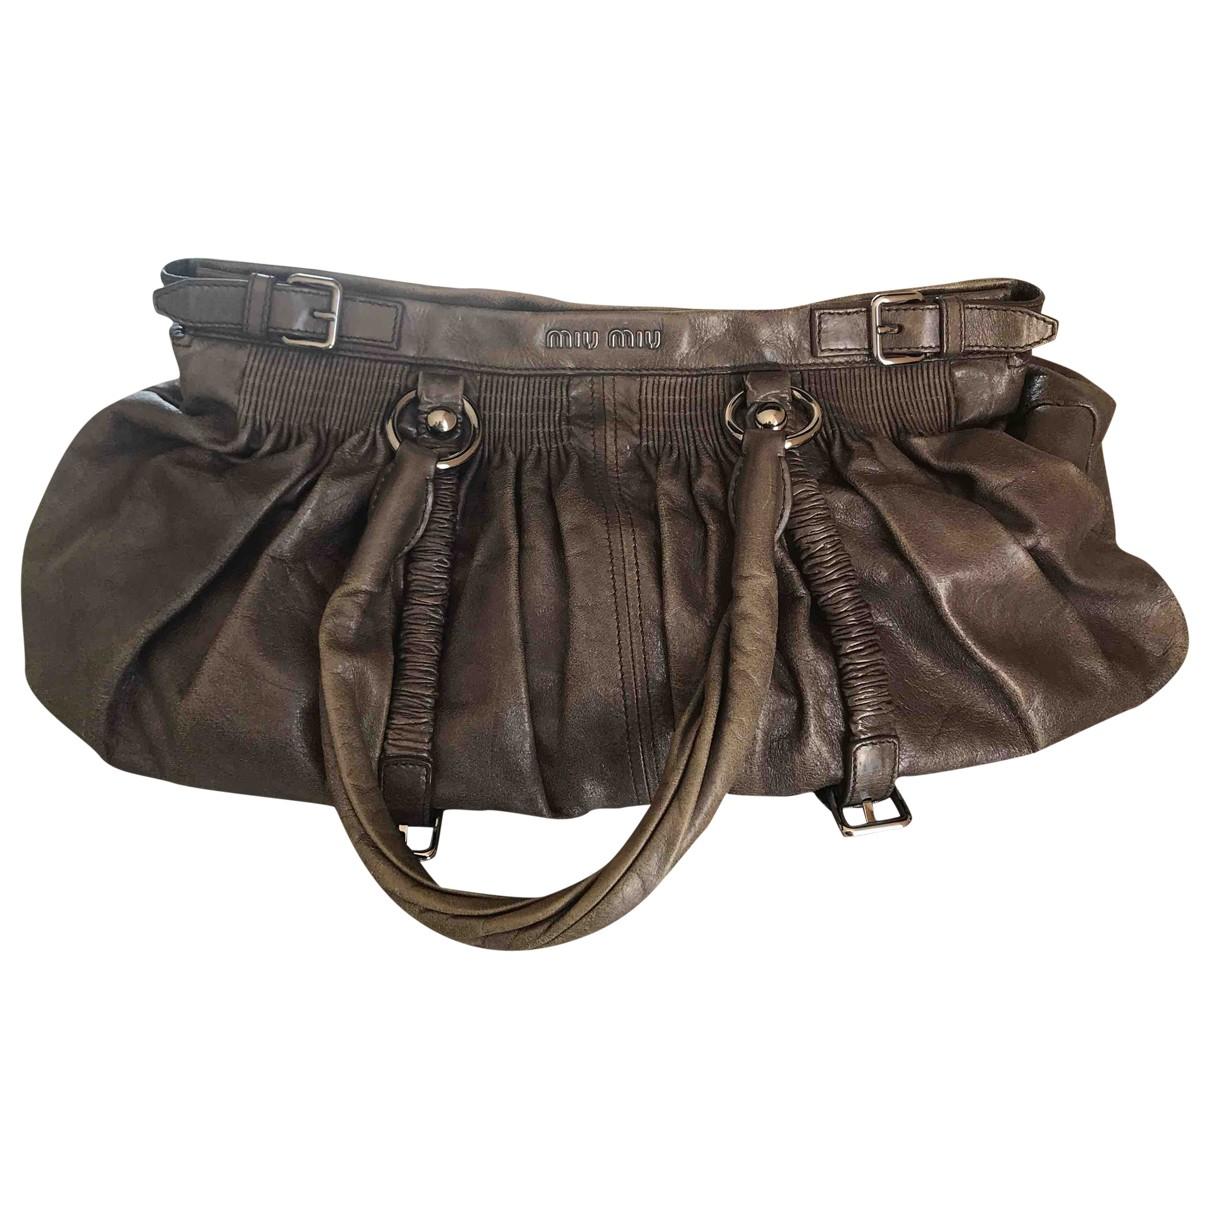 Miu Miu \N Anthracite Leather handbag for Women \N